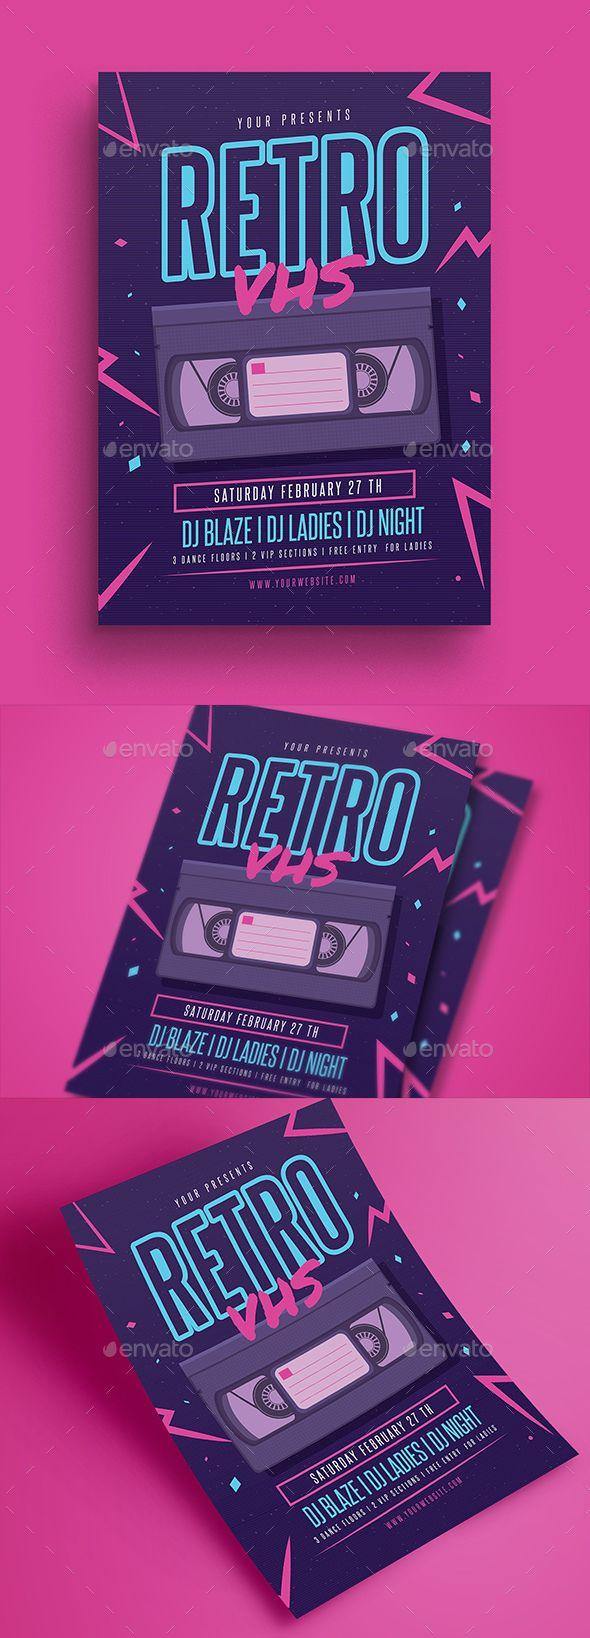 Retro VHS Music Flyer — Photoshop PSD #90's #vector • Download ➝ graphicri…